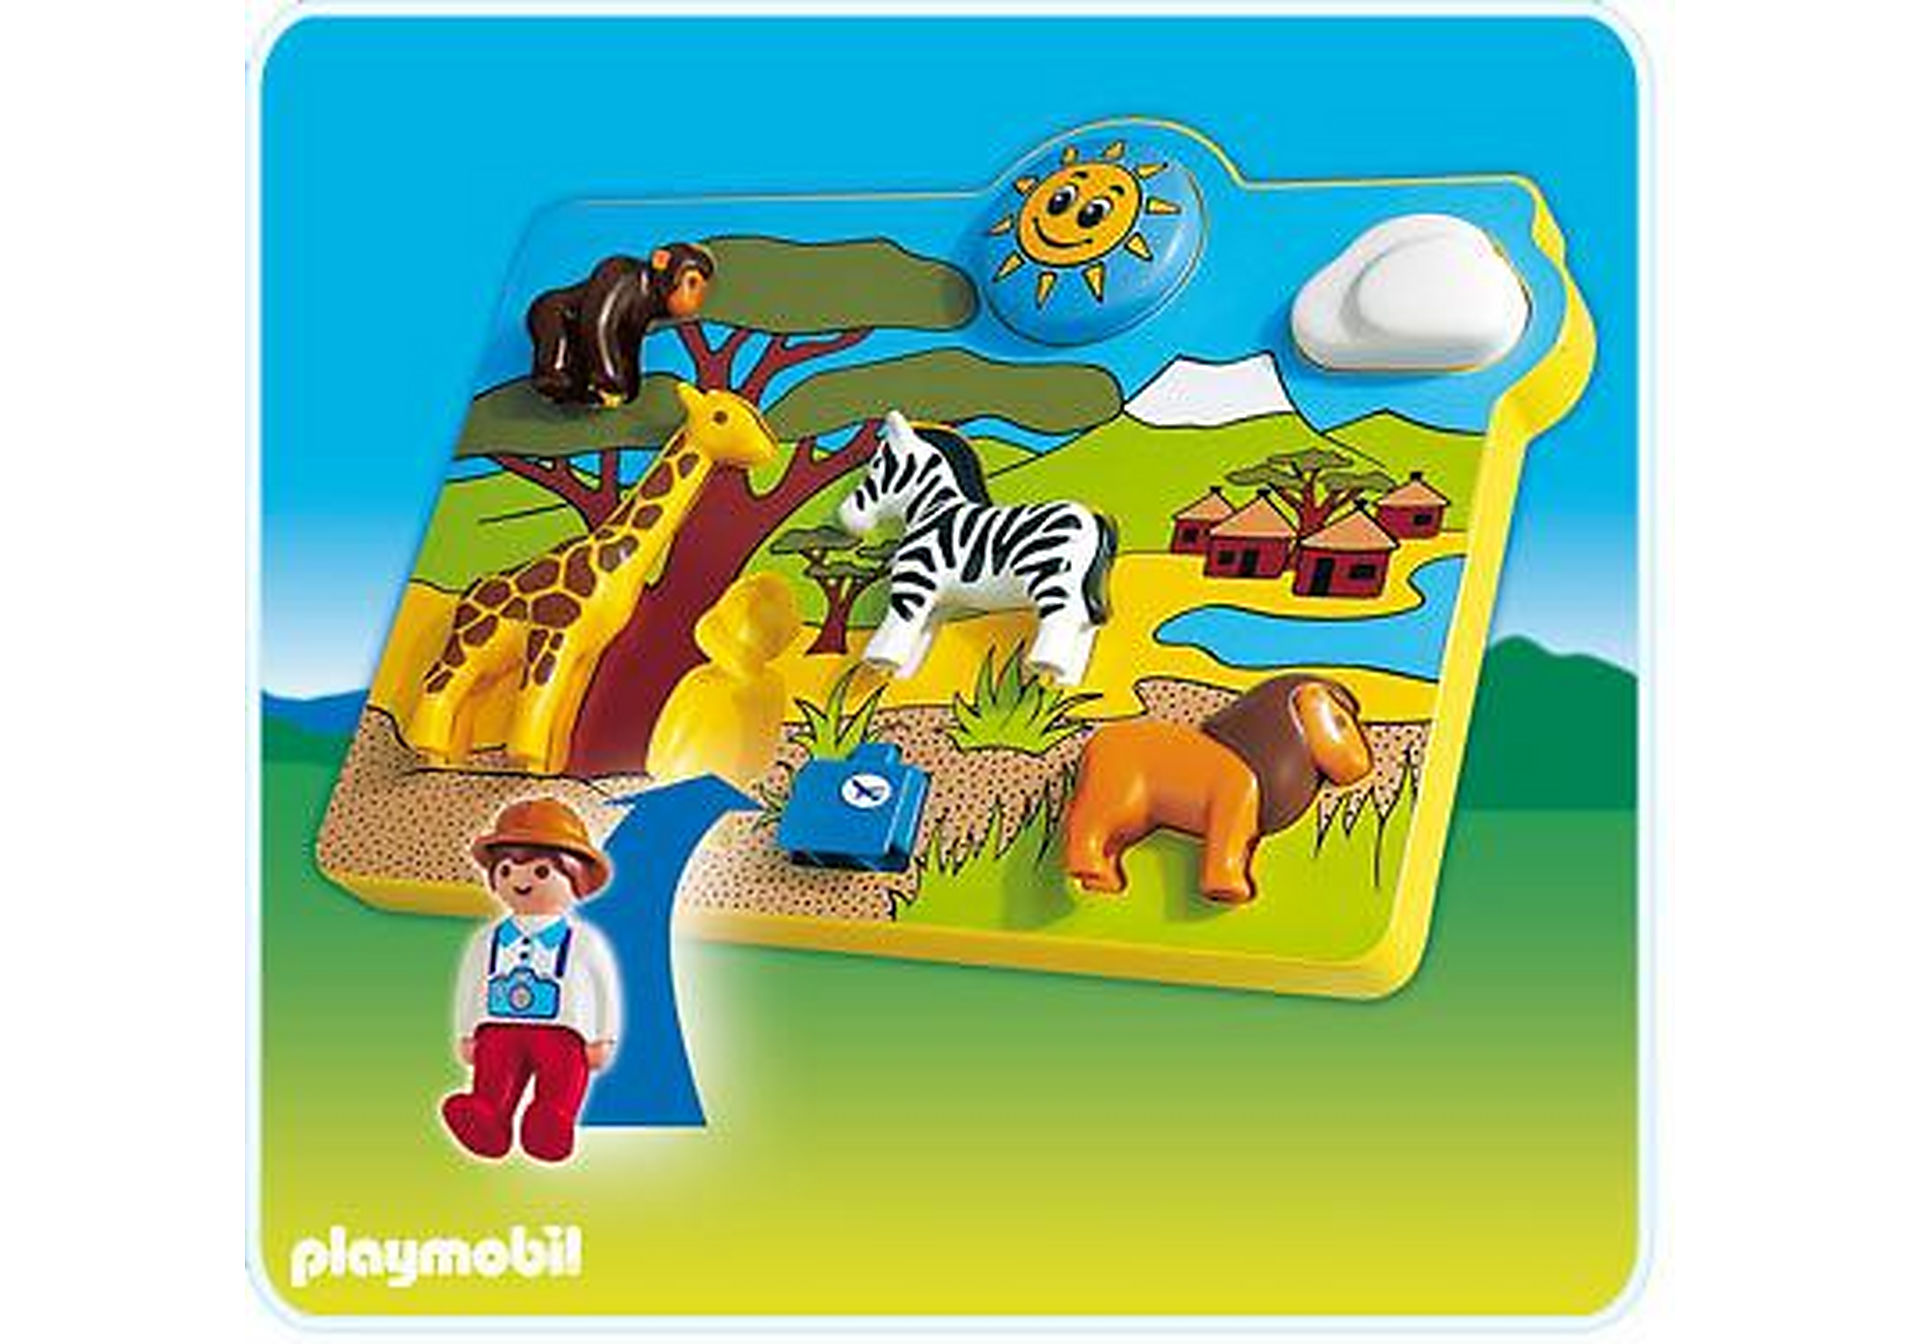 6745-A Spielpuzzle Wildtiere zoom image1